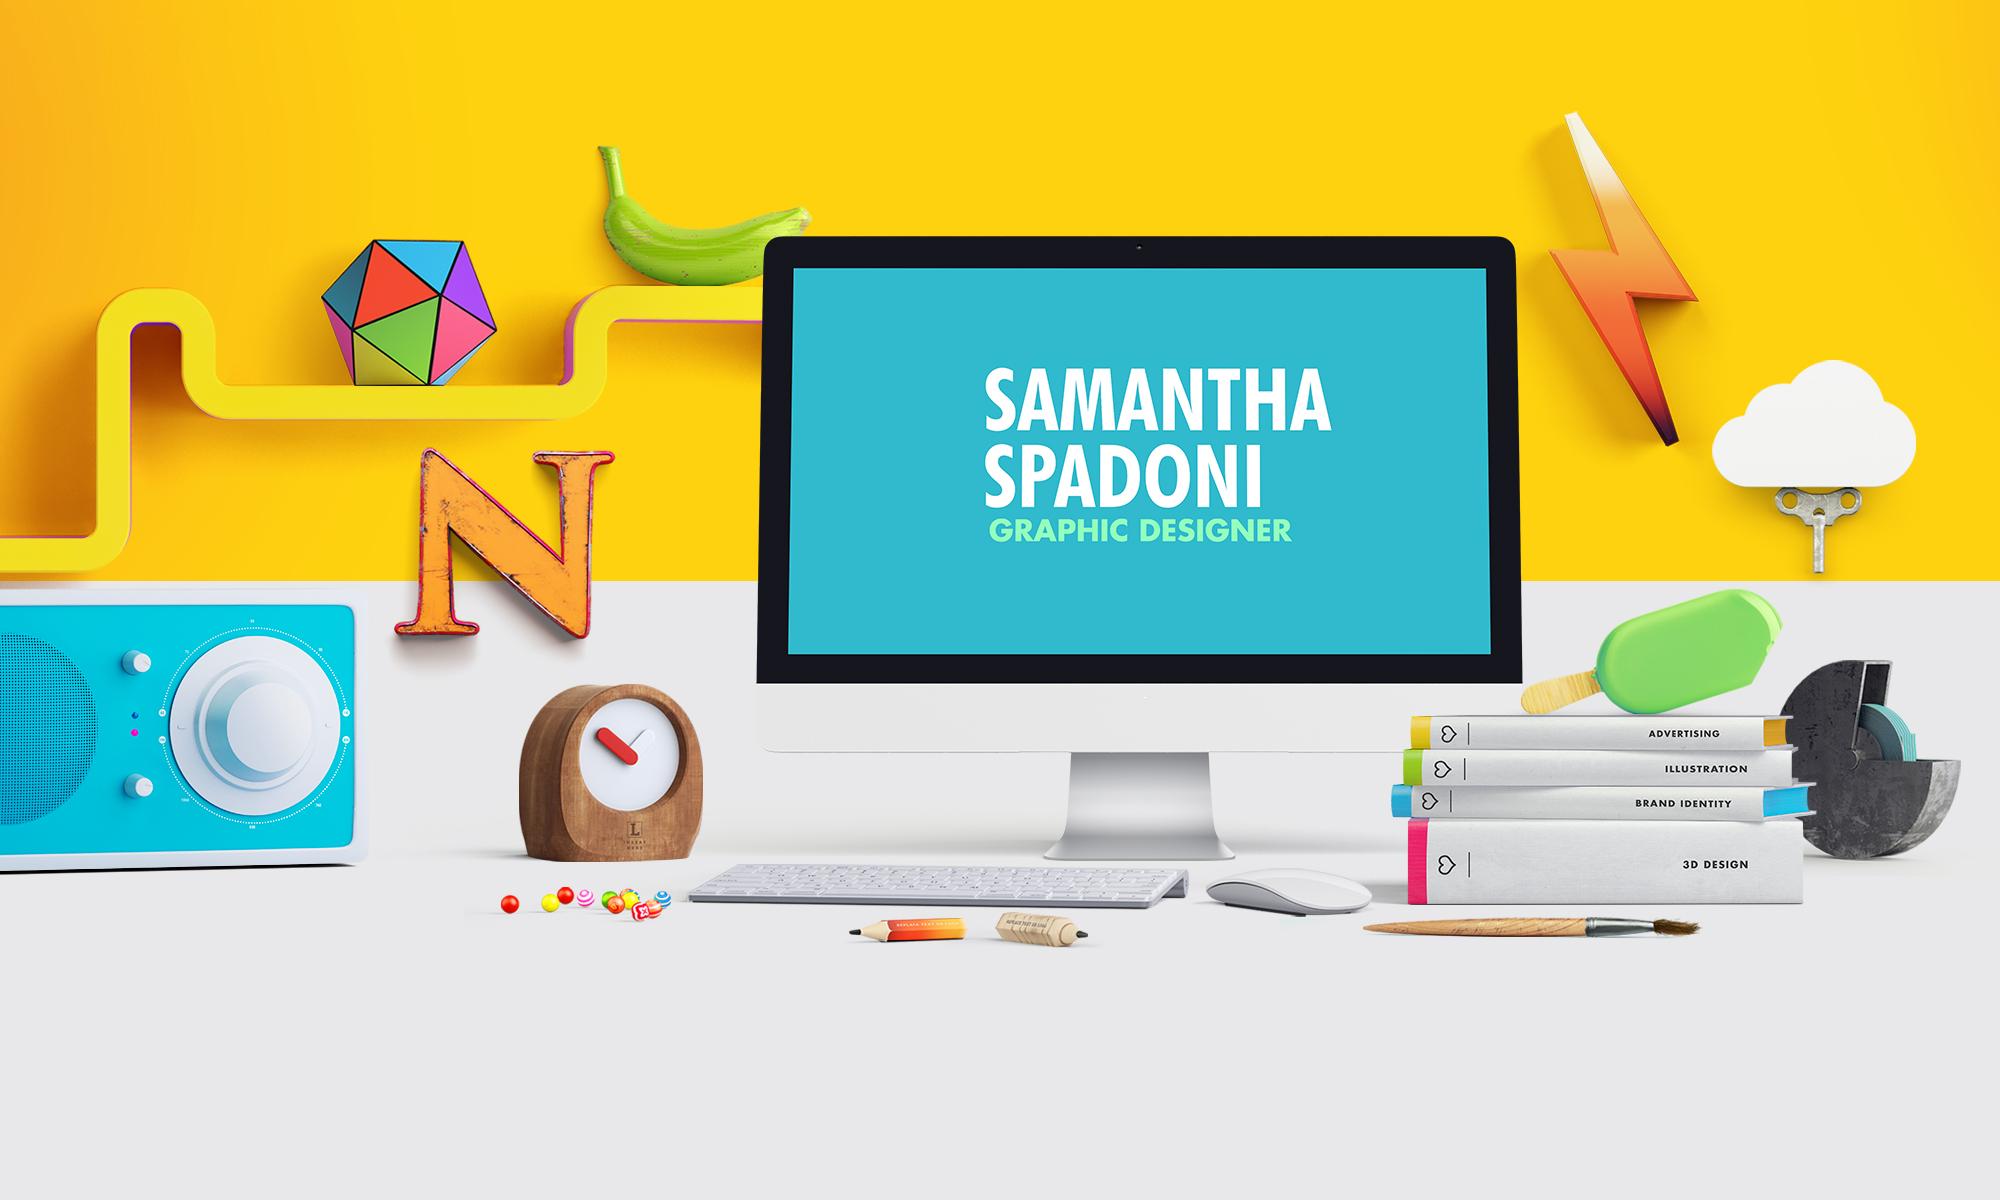 SAMANTHA SPADONI - graphic designer